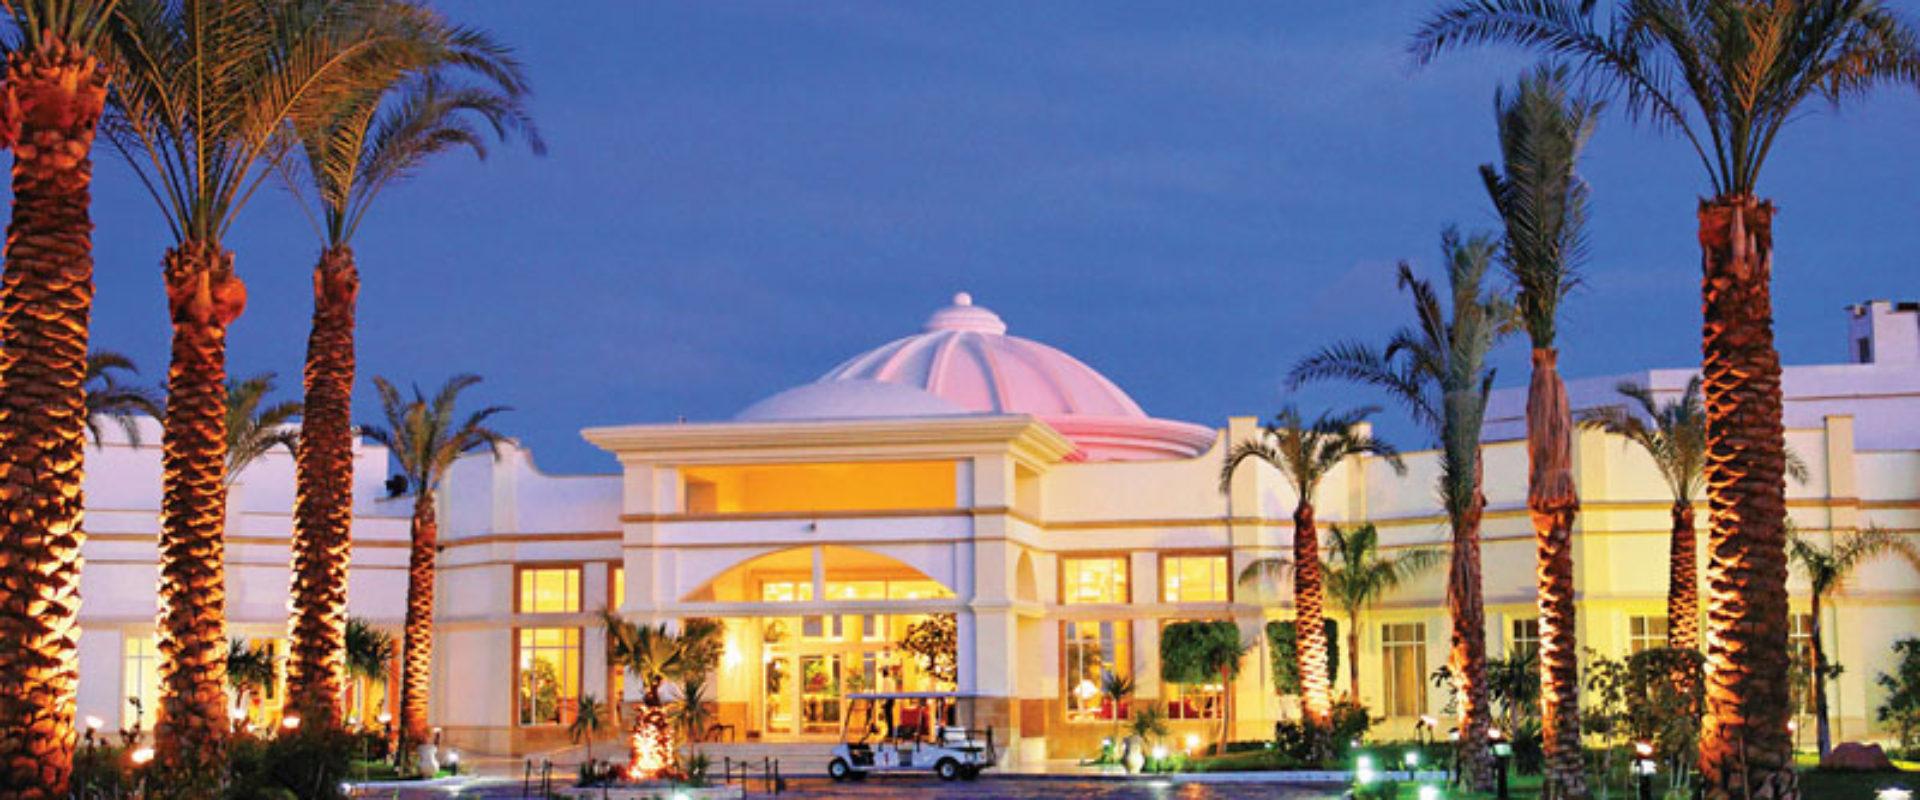 Egipt, Sharm El Sheikh, Renaissance Golden View Beach Resort